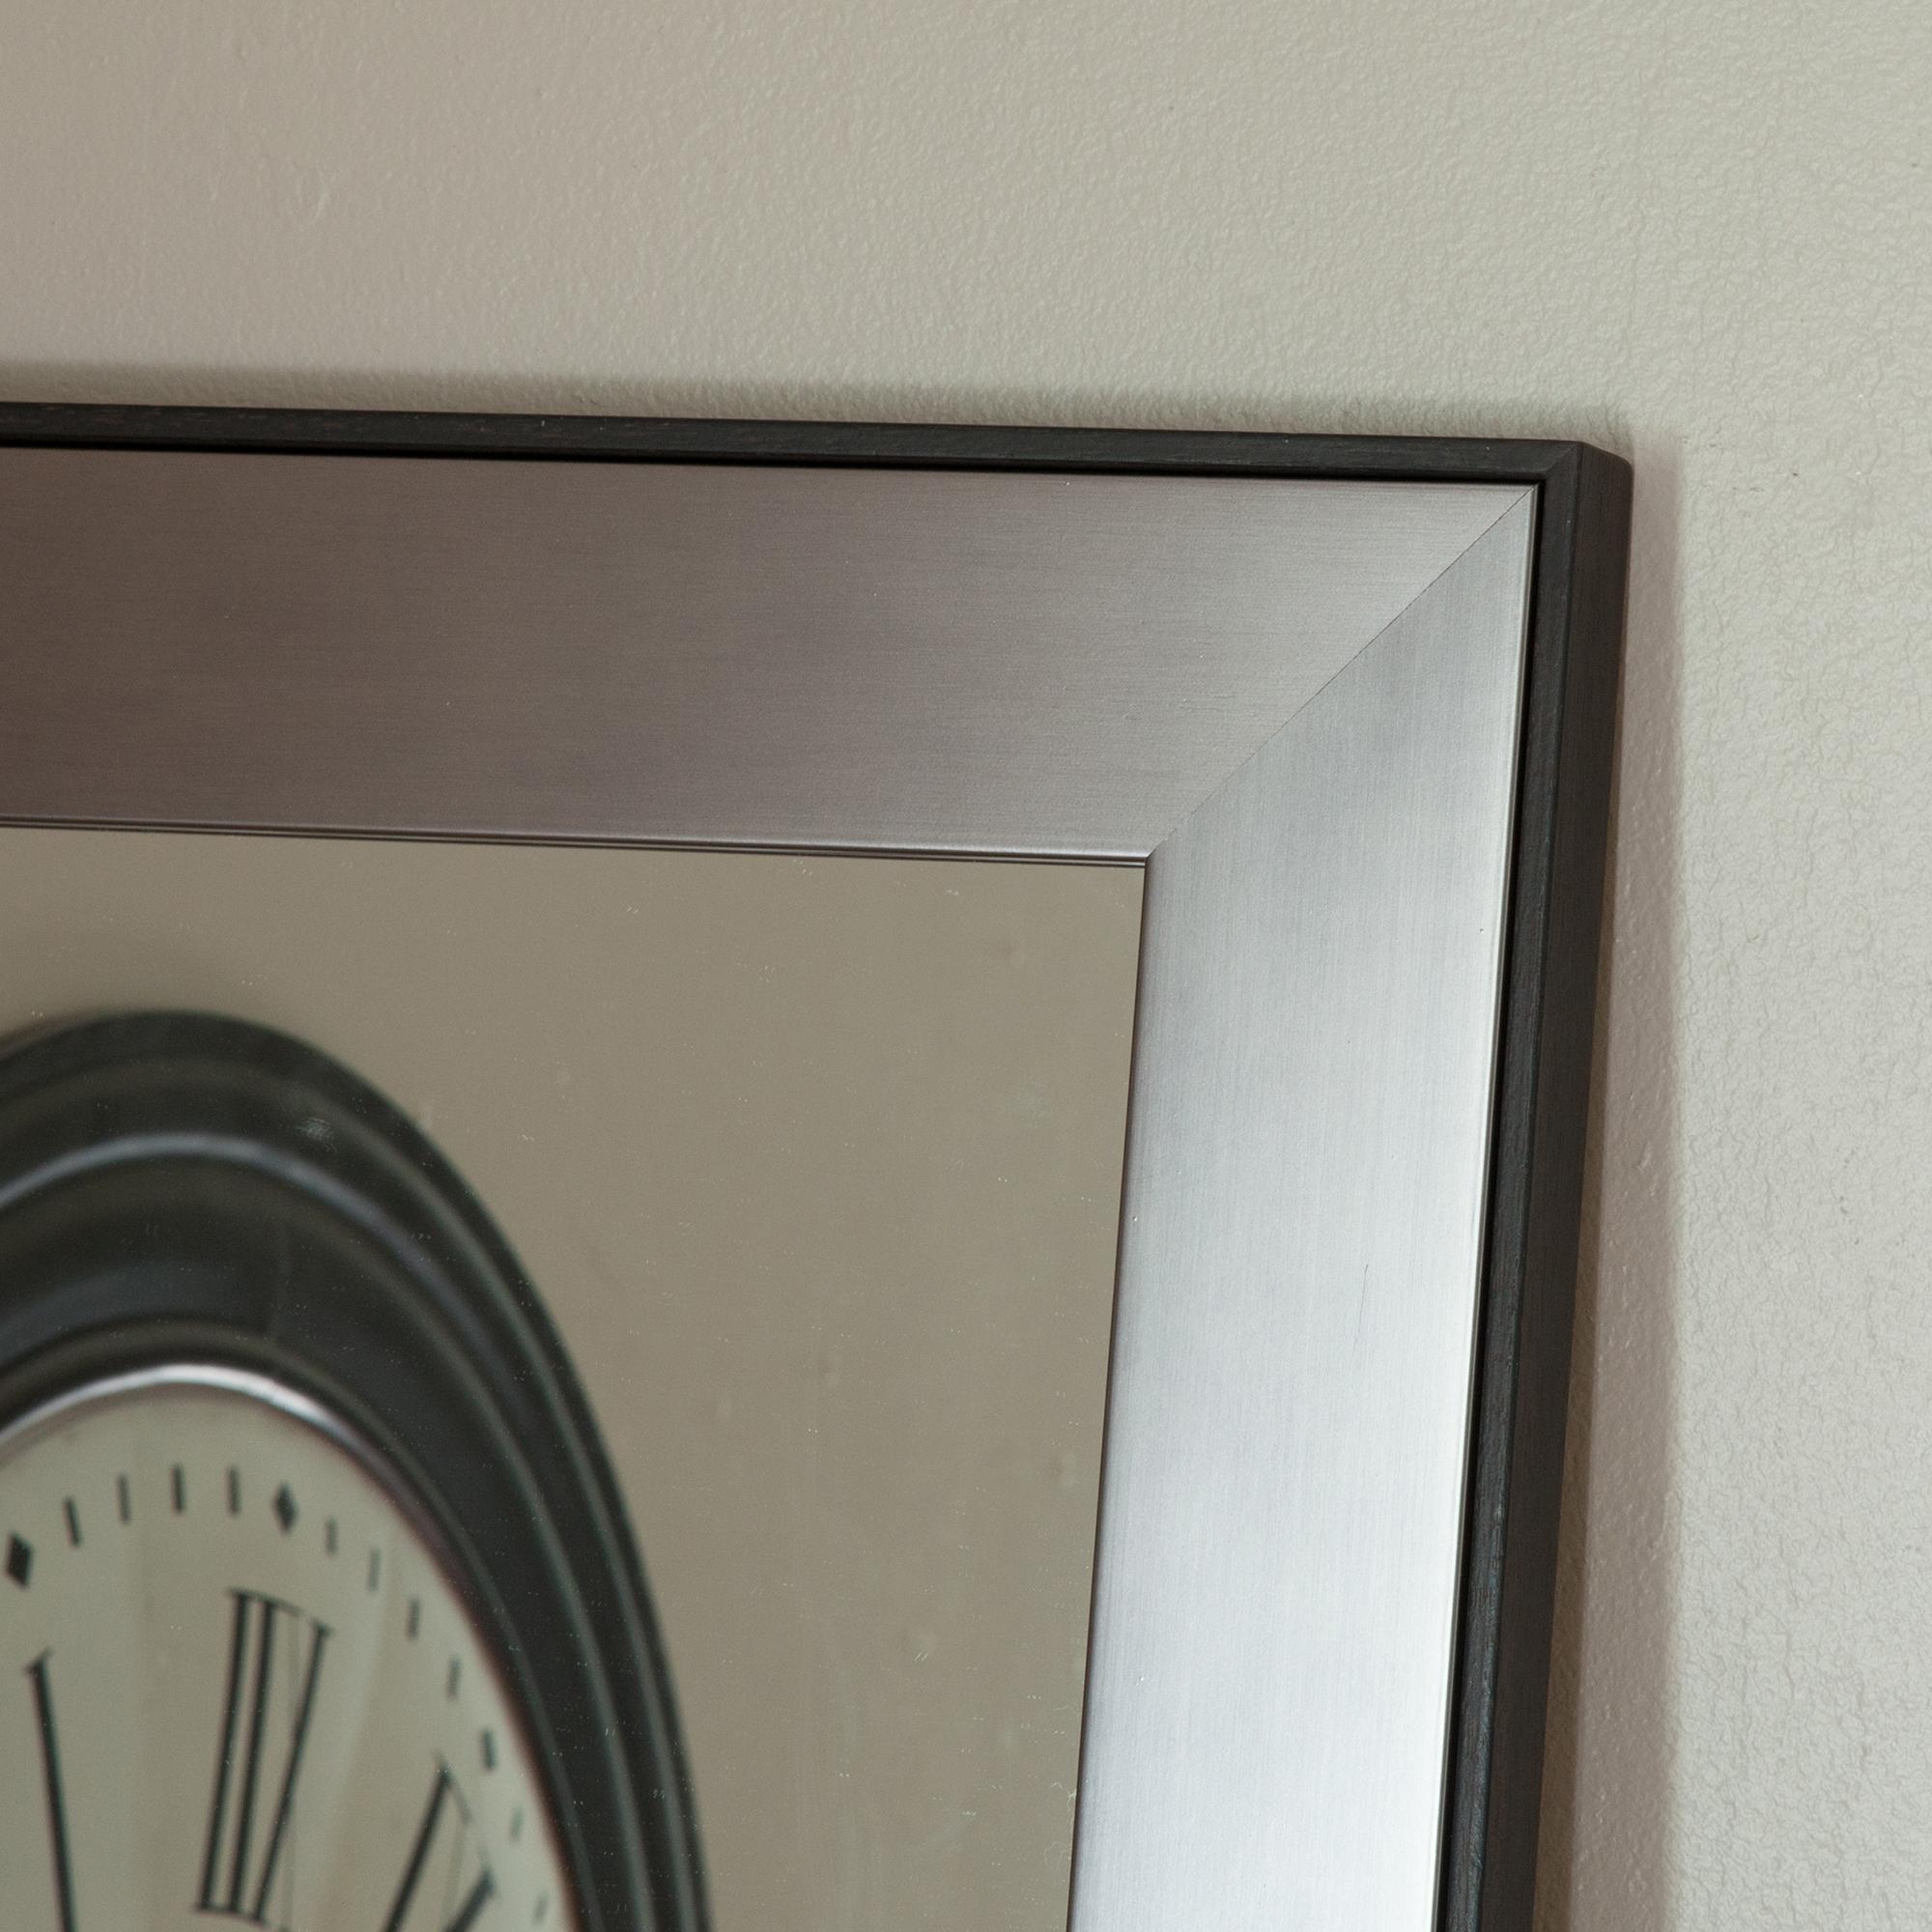 emde miroir mural rectangulaire length en bois 50 x 160